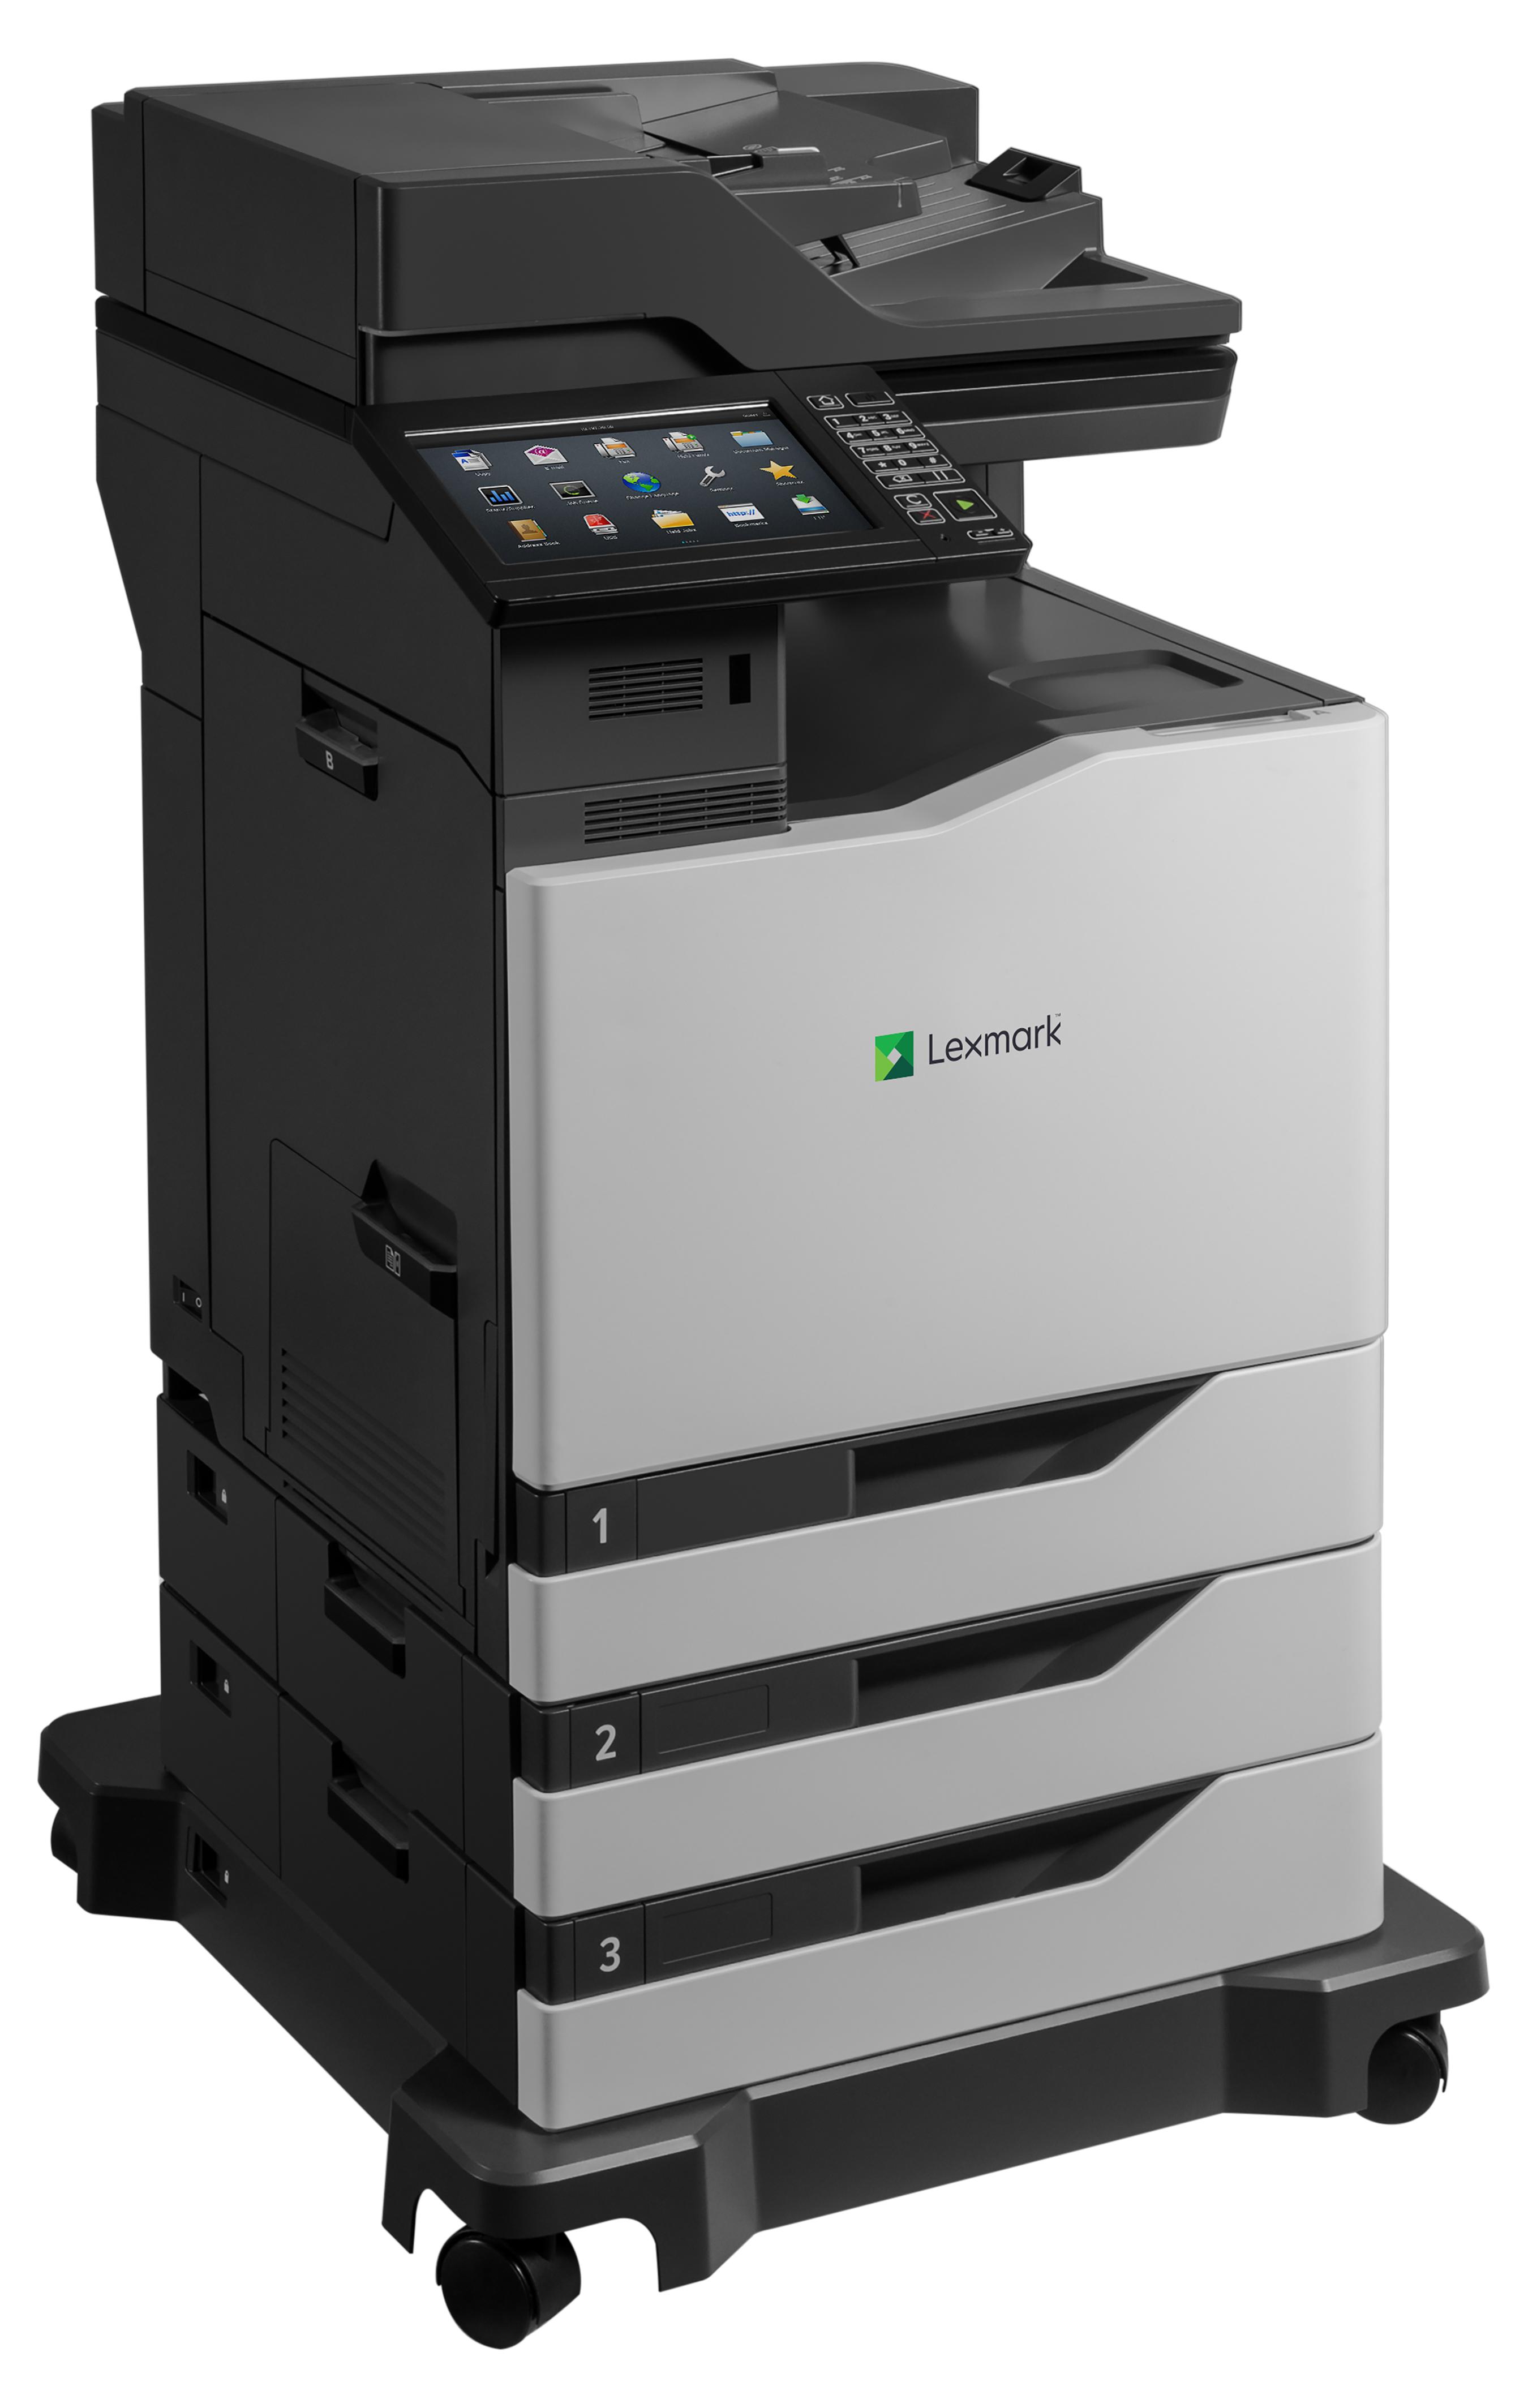 Lexmark CX825dte - Multifunktionsdrucker - Farbe